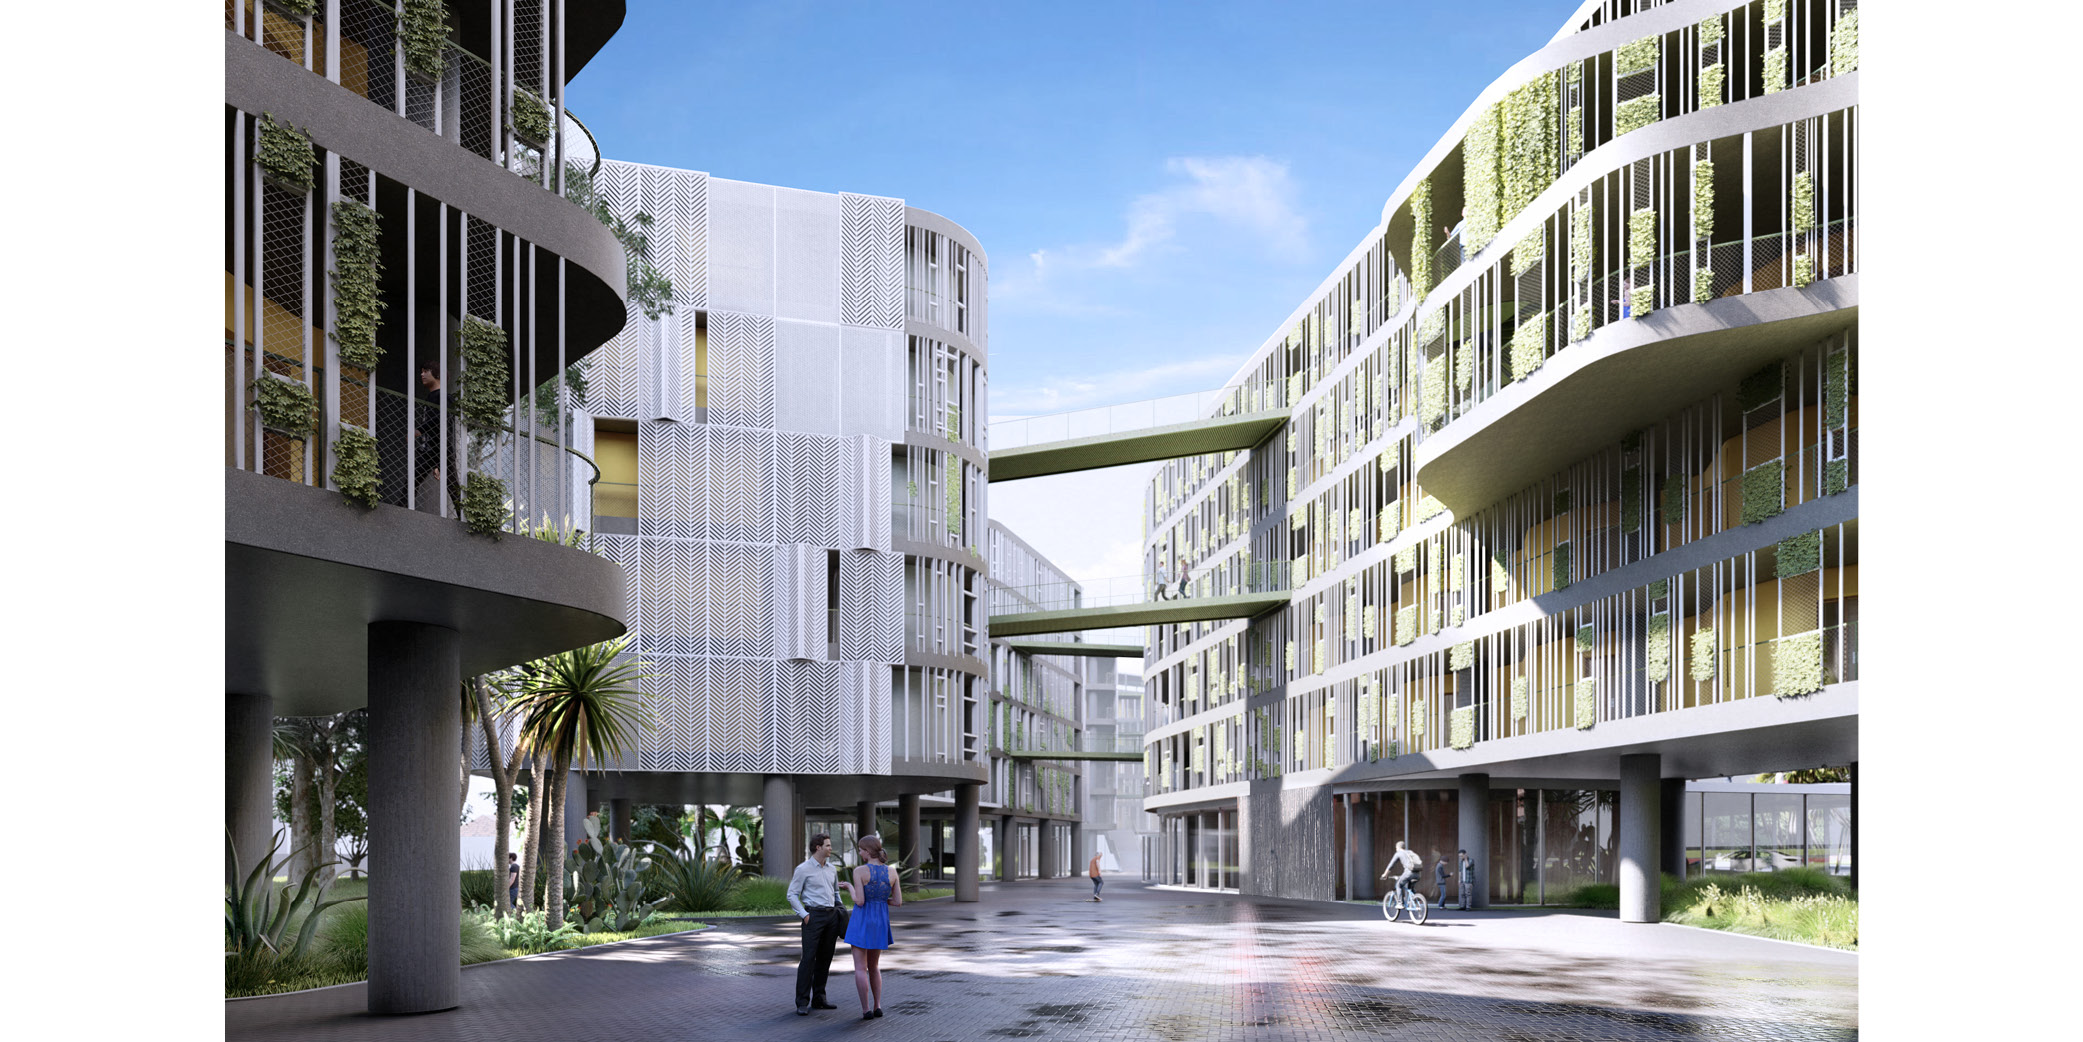 OCA architects Dormitories of the Cyprus University of Technology in Limassol - Κοιτώνες Κύπρος Λεμεσός Hernan Lleida Ruiz Bernardo Garcia Morales3